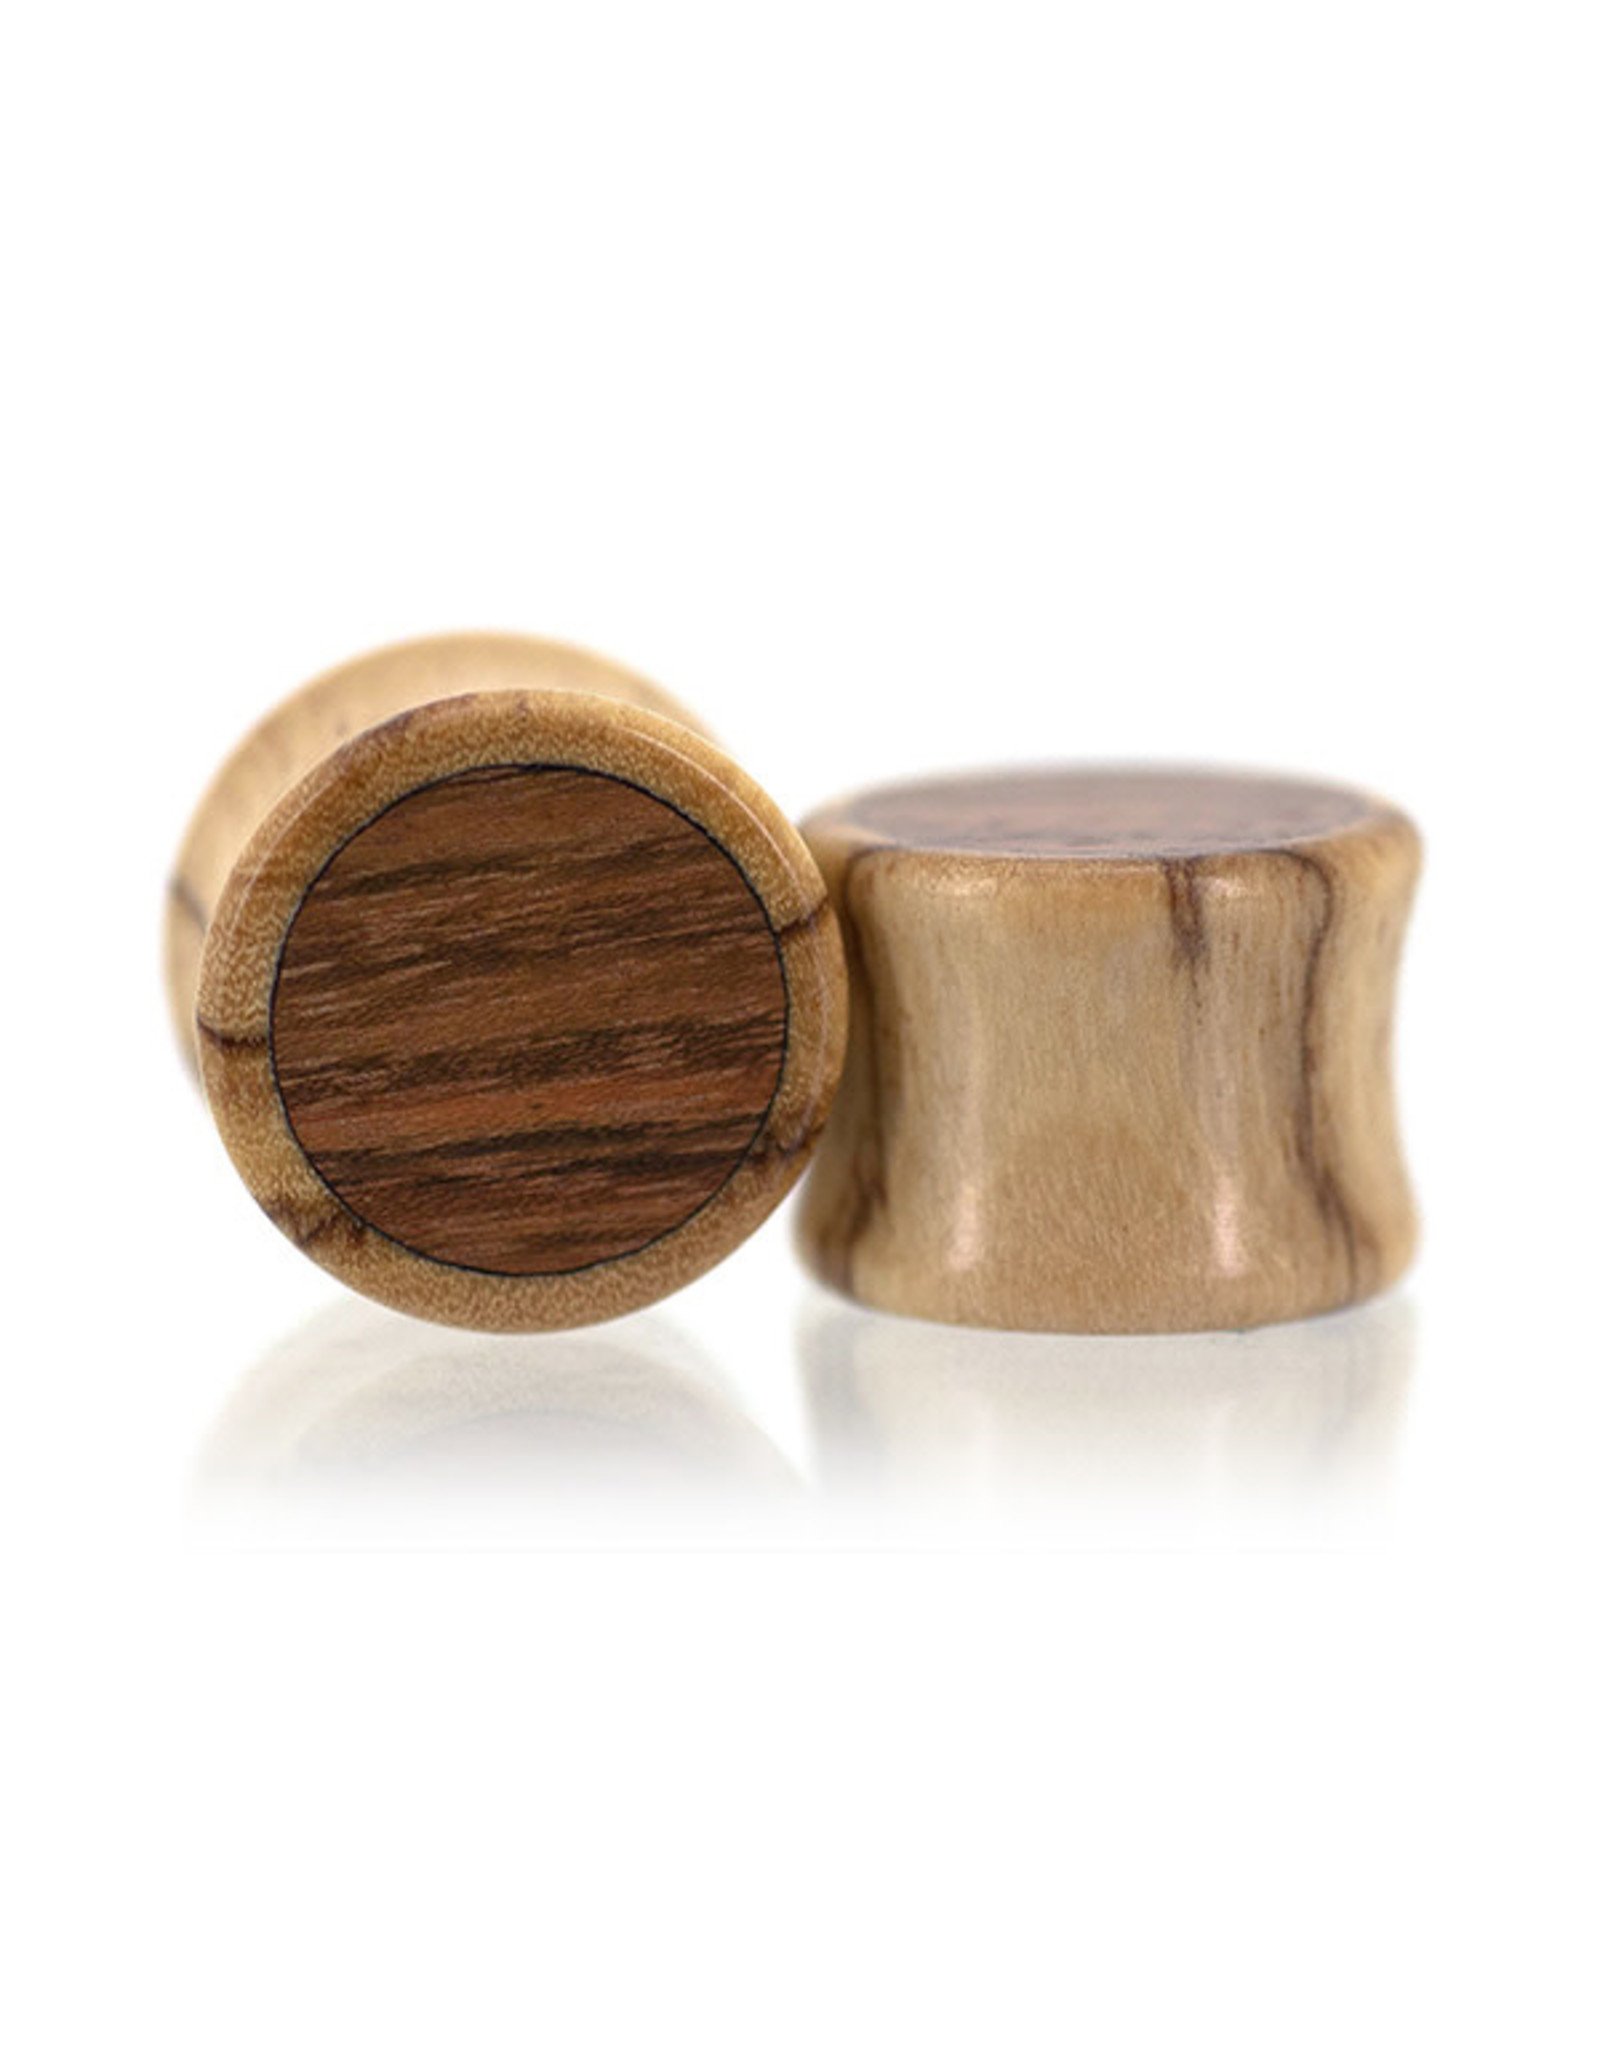 00g Two Wood Inlay Plugs